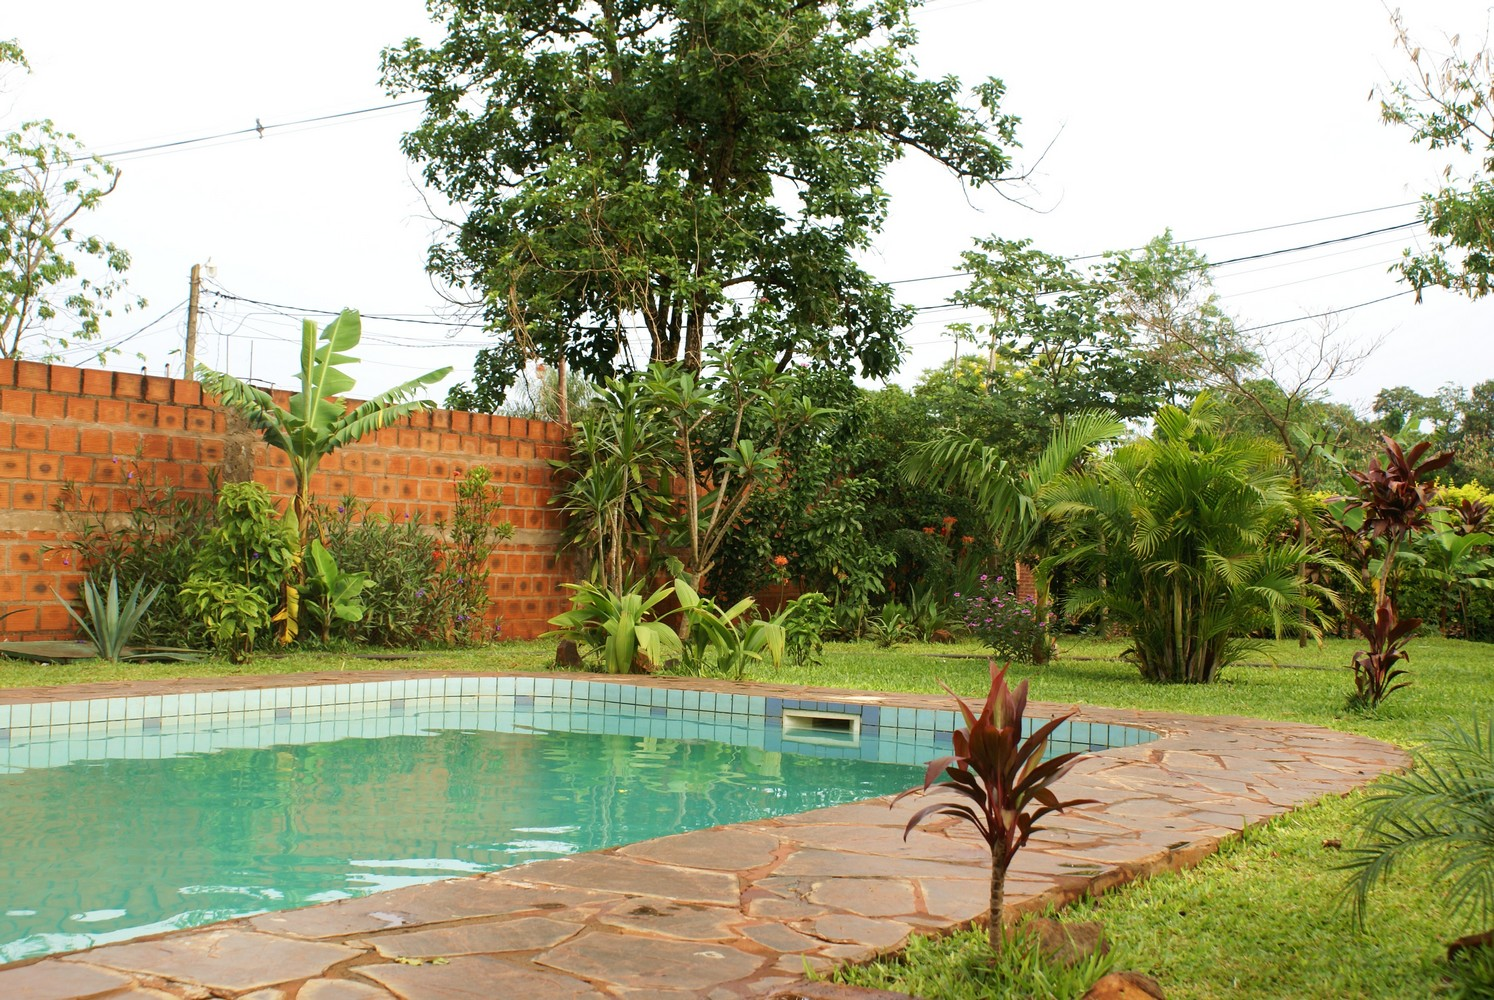 Los Tangueros - Iguazu